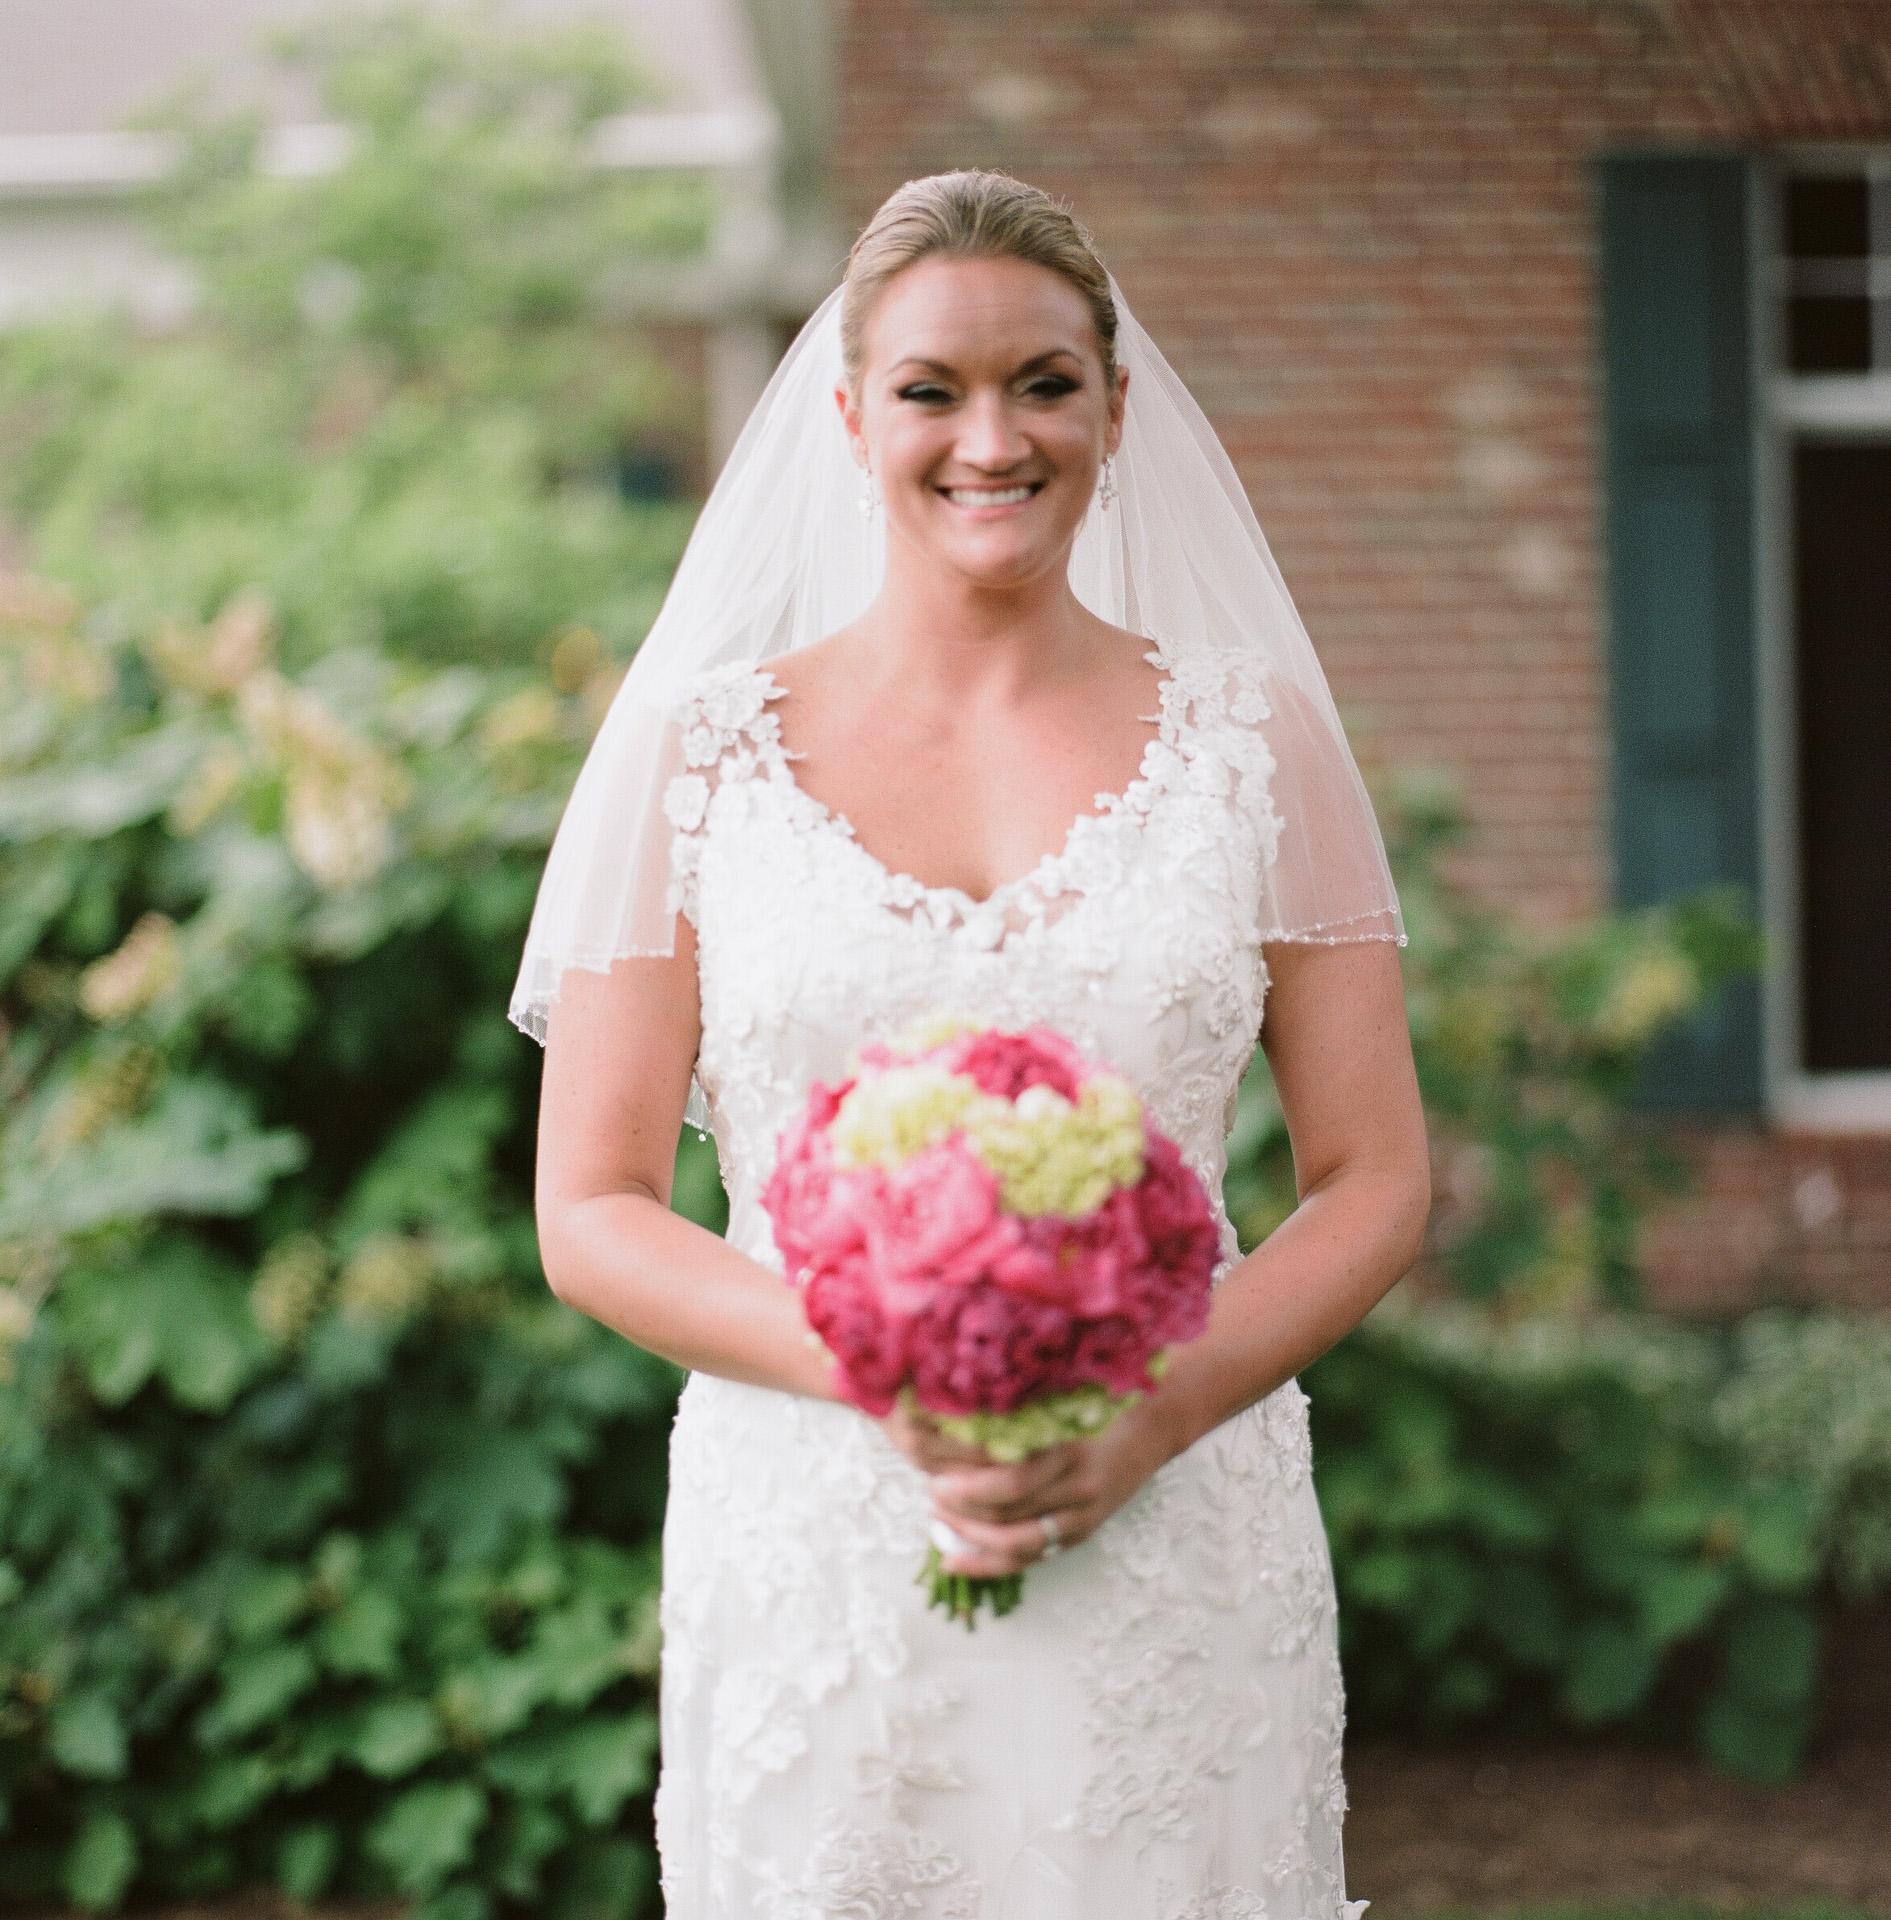 Dayton Wedding Photographer - Bride Portrait